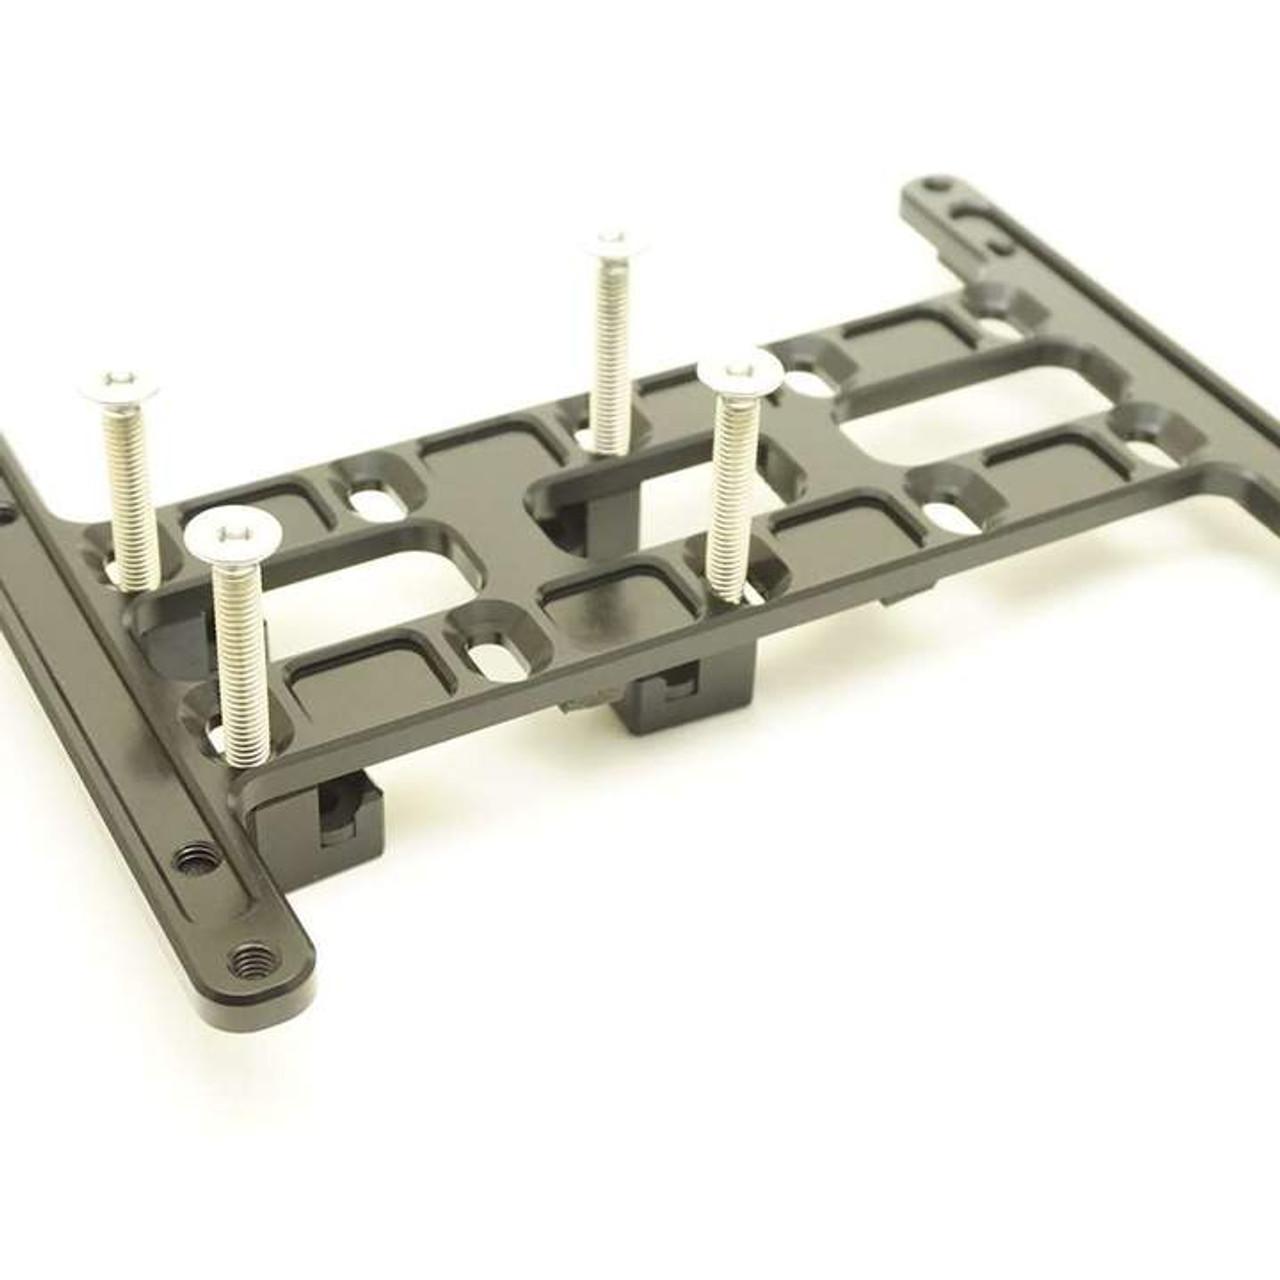 Novustech TRU Plate Relocator Kit for MK7/7.5 Golf R